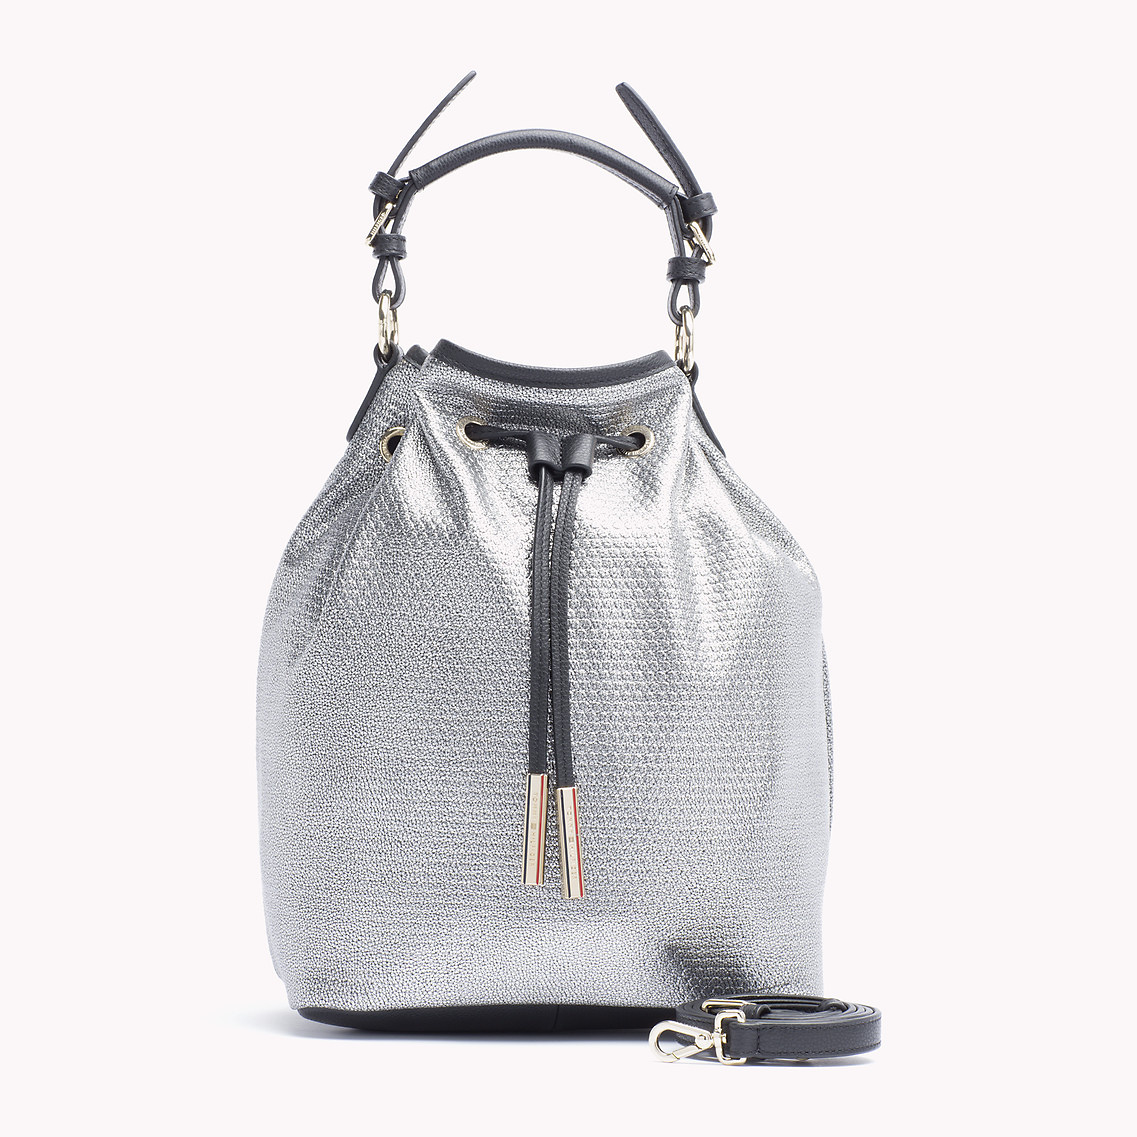 Tommy Hilfiger Silver Bucket Bag in Metallic - Lyst f3e942f711